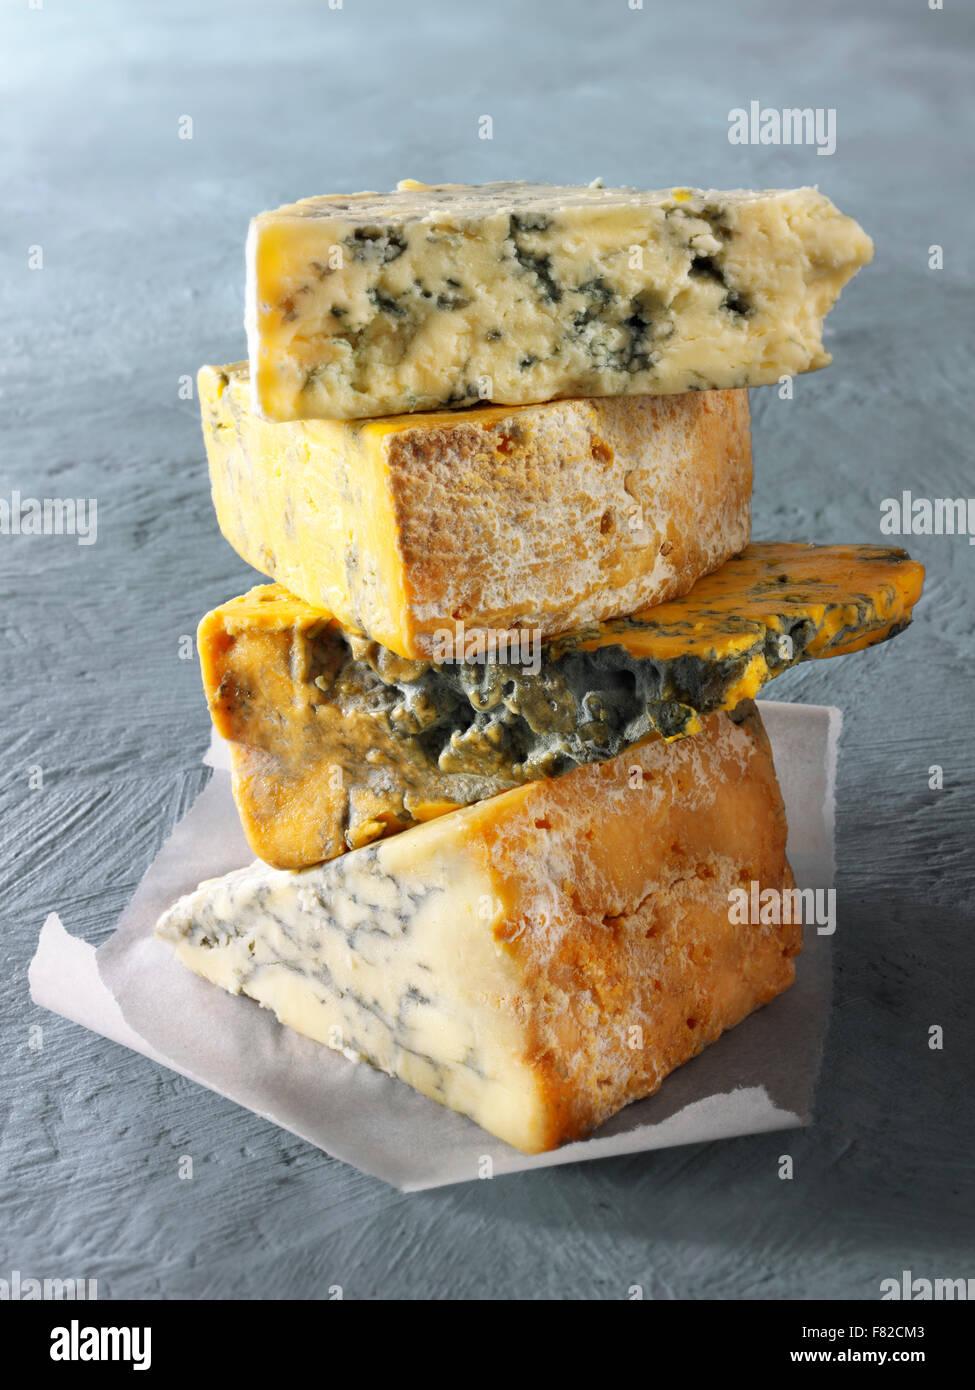 Close up of wedges of blue Cheese - From the top - Blue Vinney, Stilton, Blacksticks Blue, Creamy Stilton - Stock Image